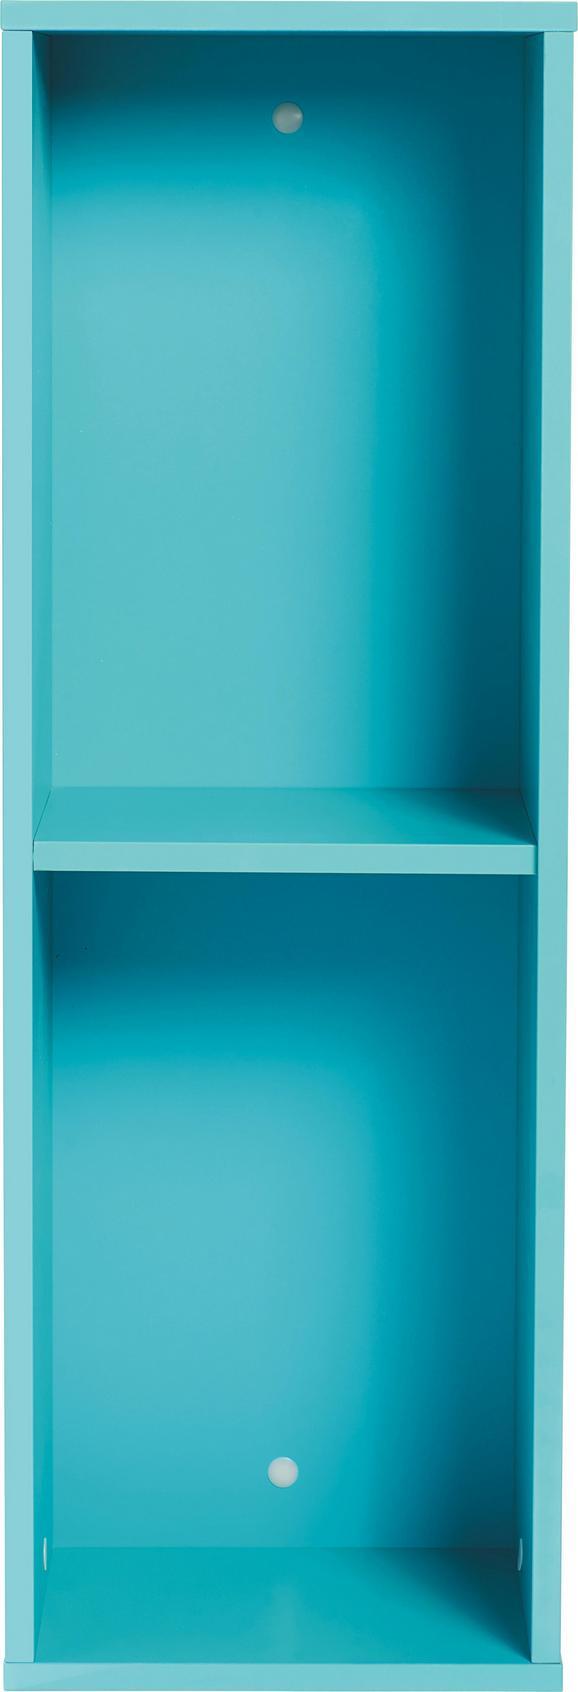 Wandregal Hellblau - Hellblau, MODERN, Holzwerkstoff (90/30/26cm) - Mömax modern living